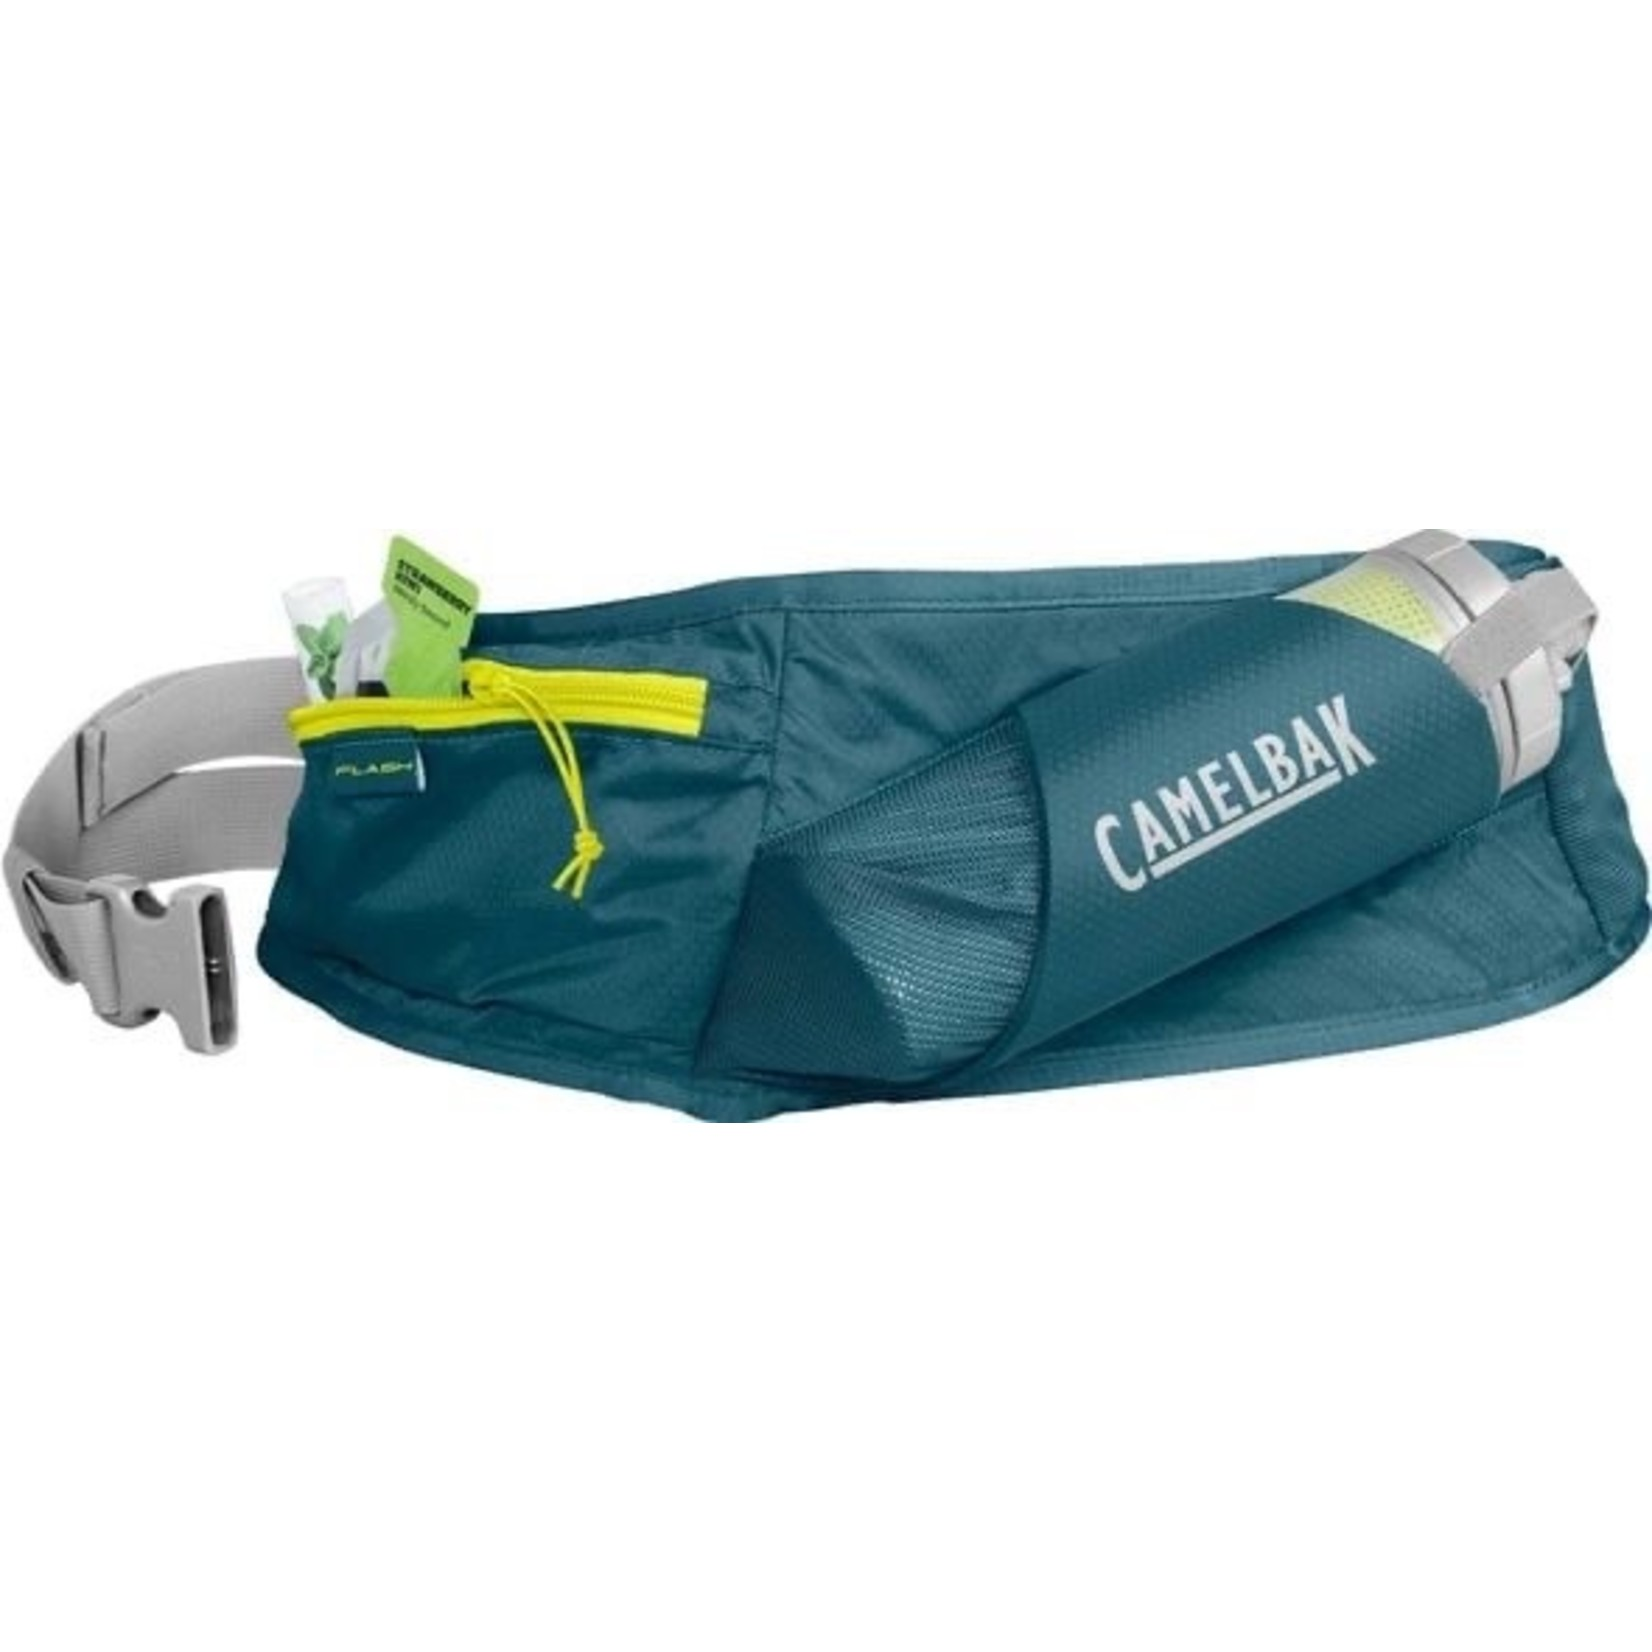 CAMELBAK Hydration System - Belt - Flash 17oz